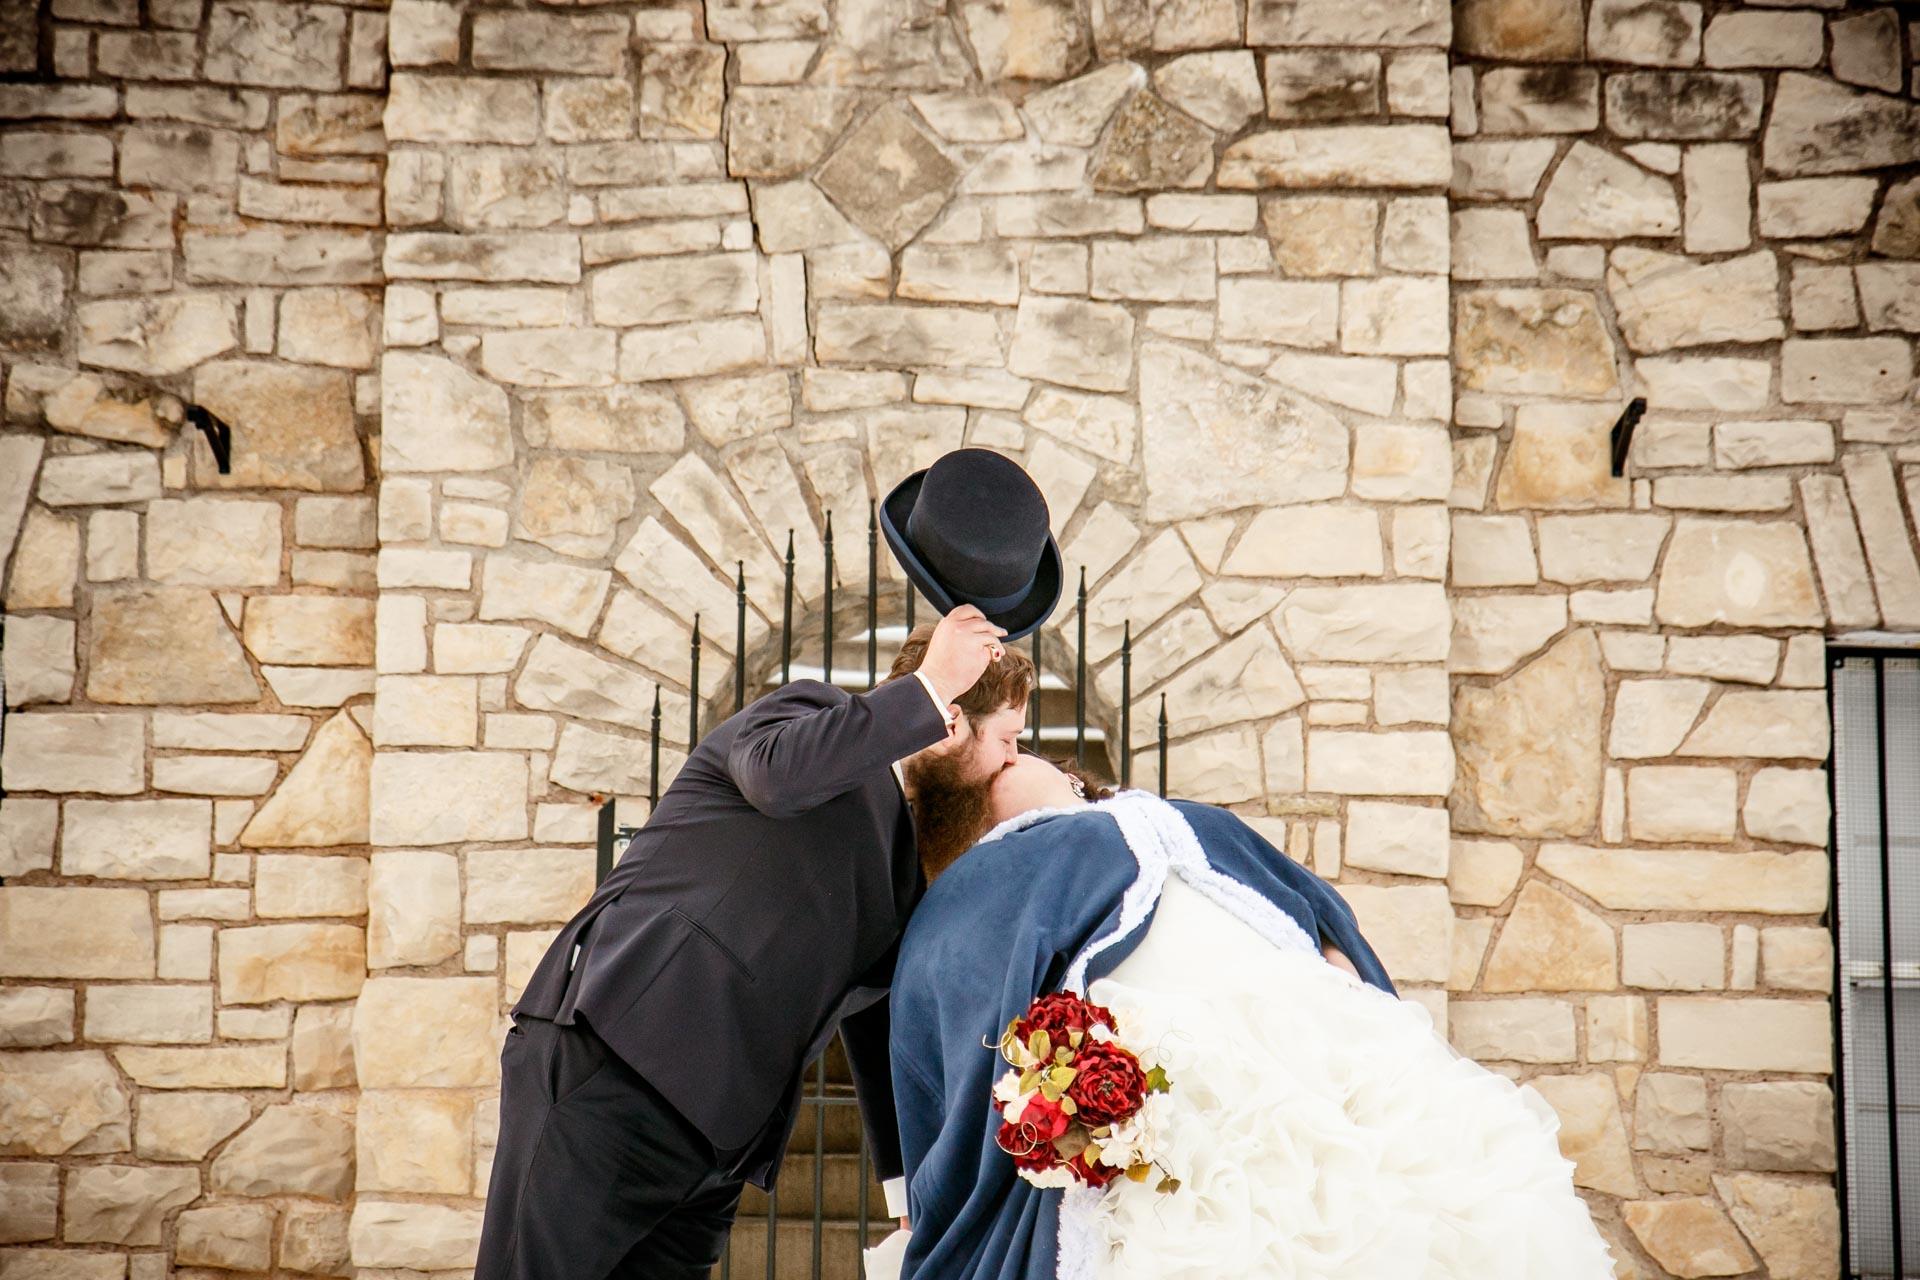 wedding-adam-shea-photography-green-bay-appleton-neenah-photographer-06.jpg